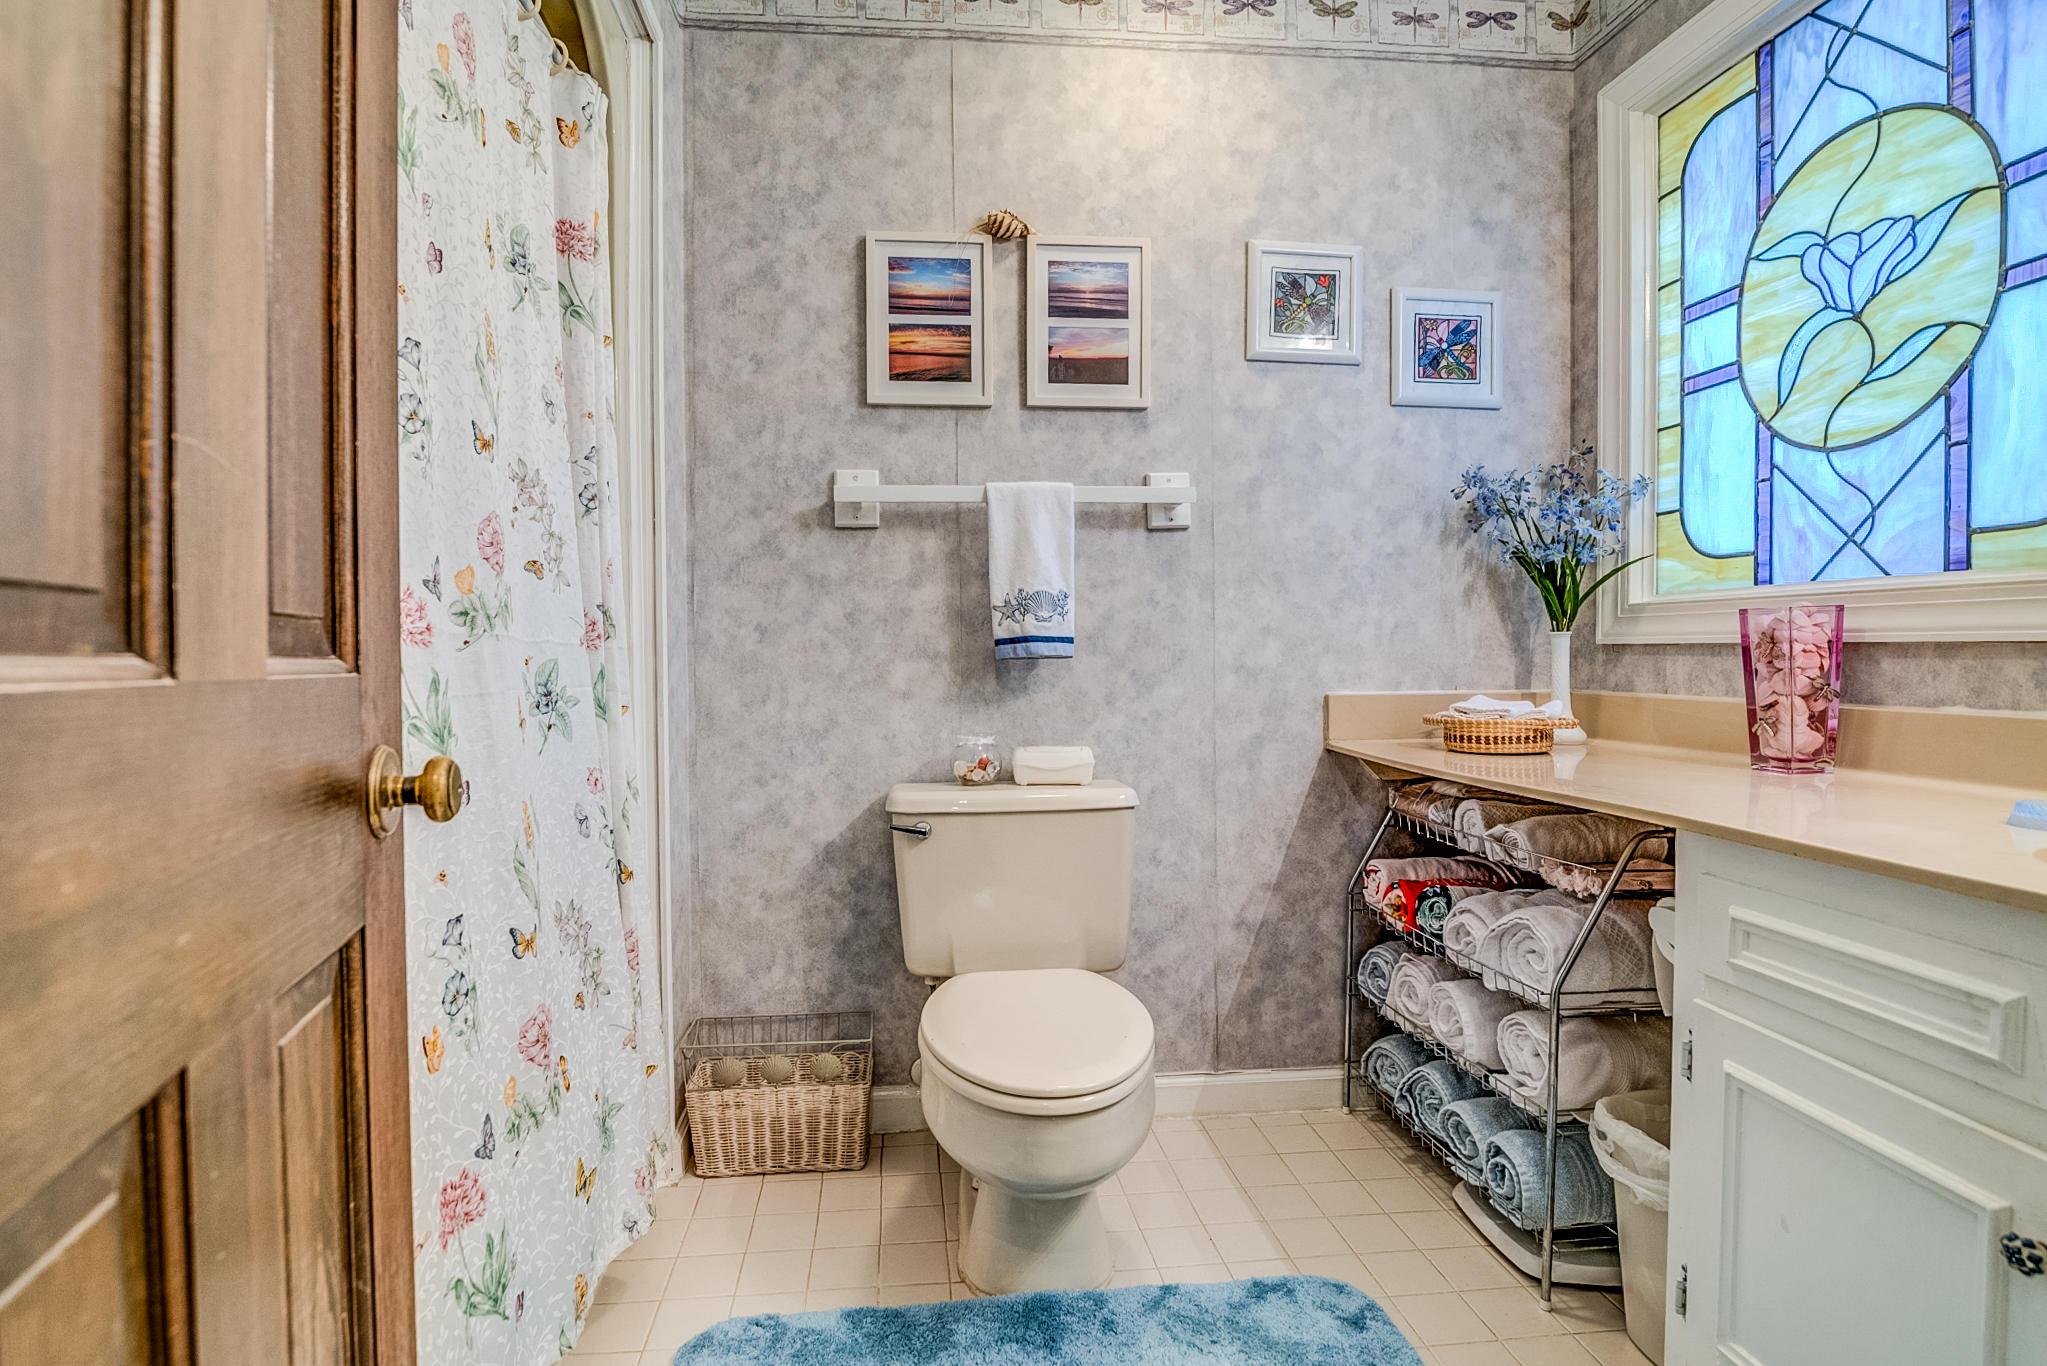 Bay Pointe Villas Homes For Sale - 2127 Landfall, Johns Island, SC - 4